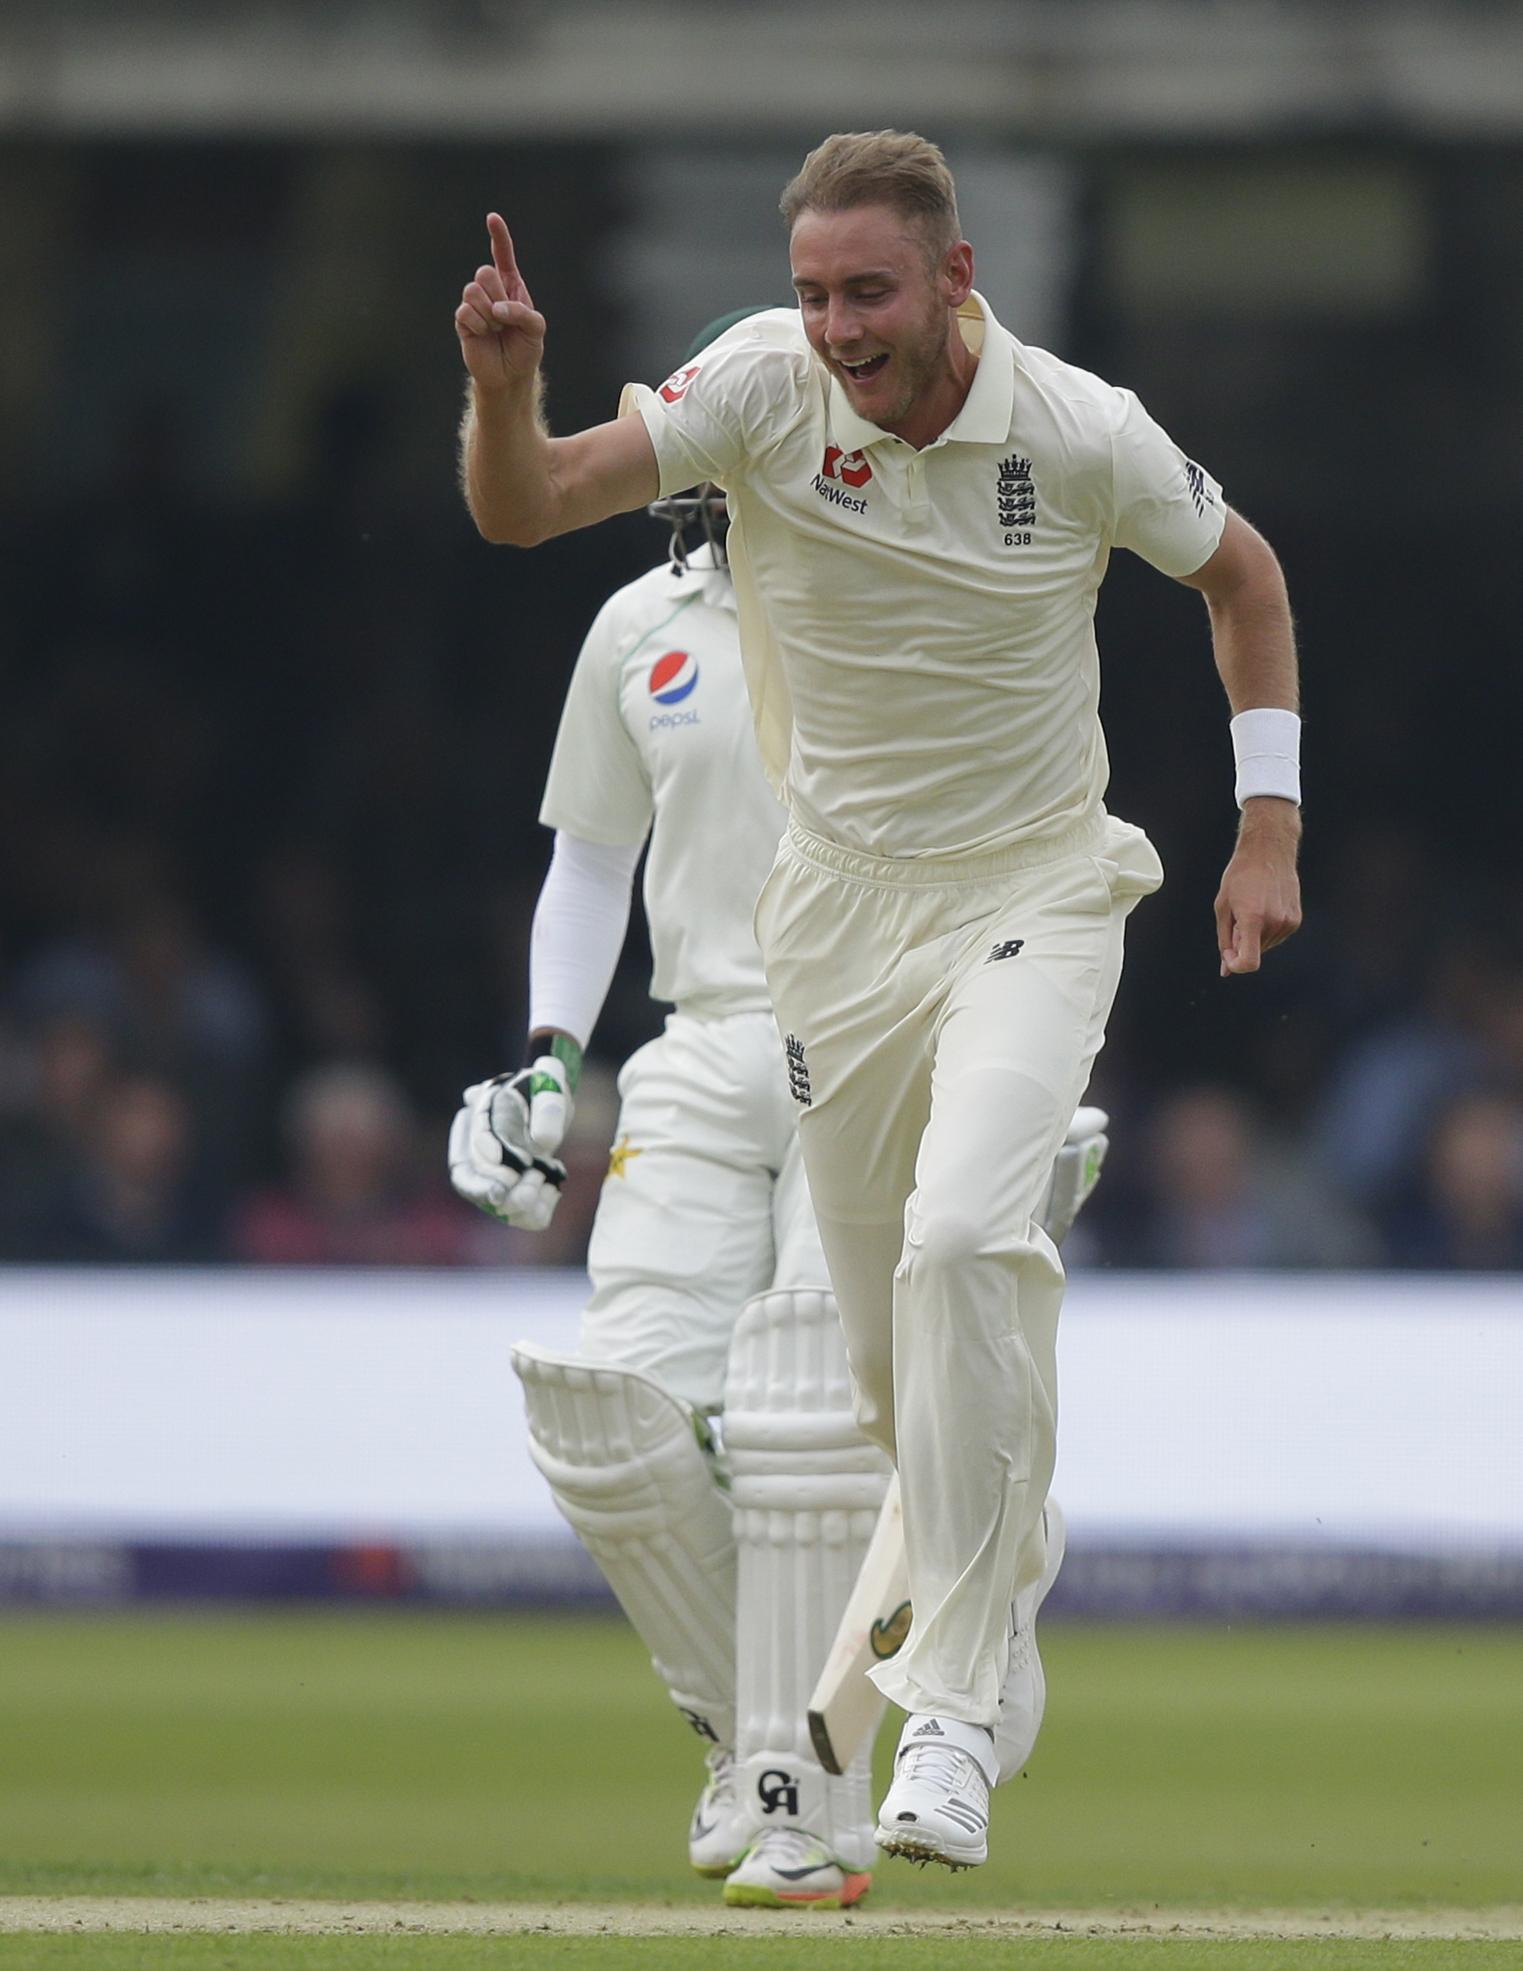 Stuart Broad claimed the wicket of Pakistan opener Imam-ul-Haq